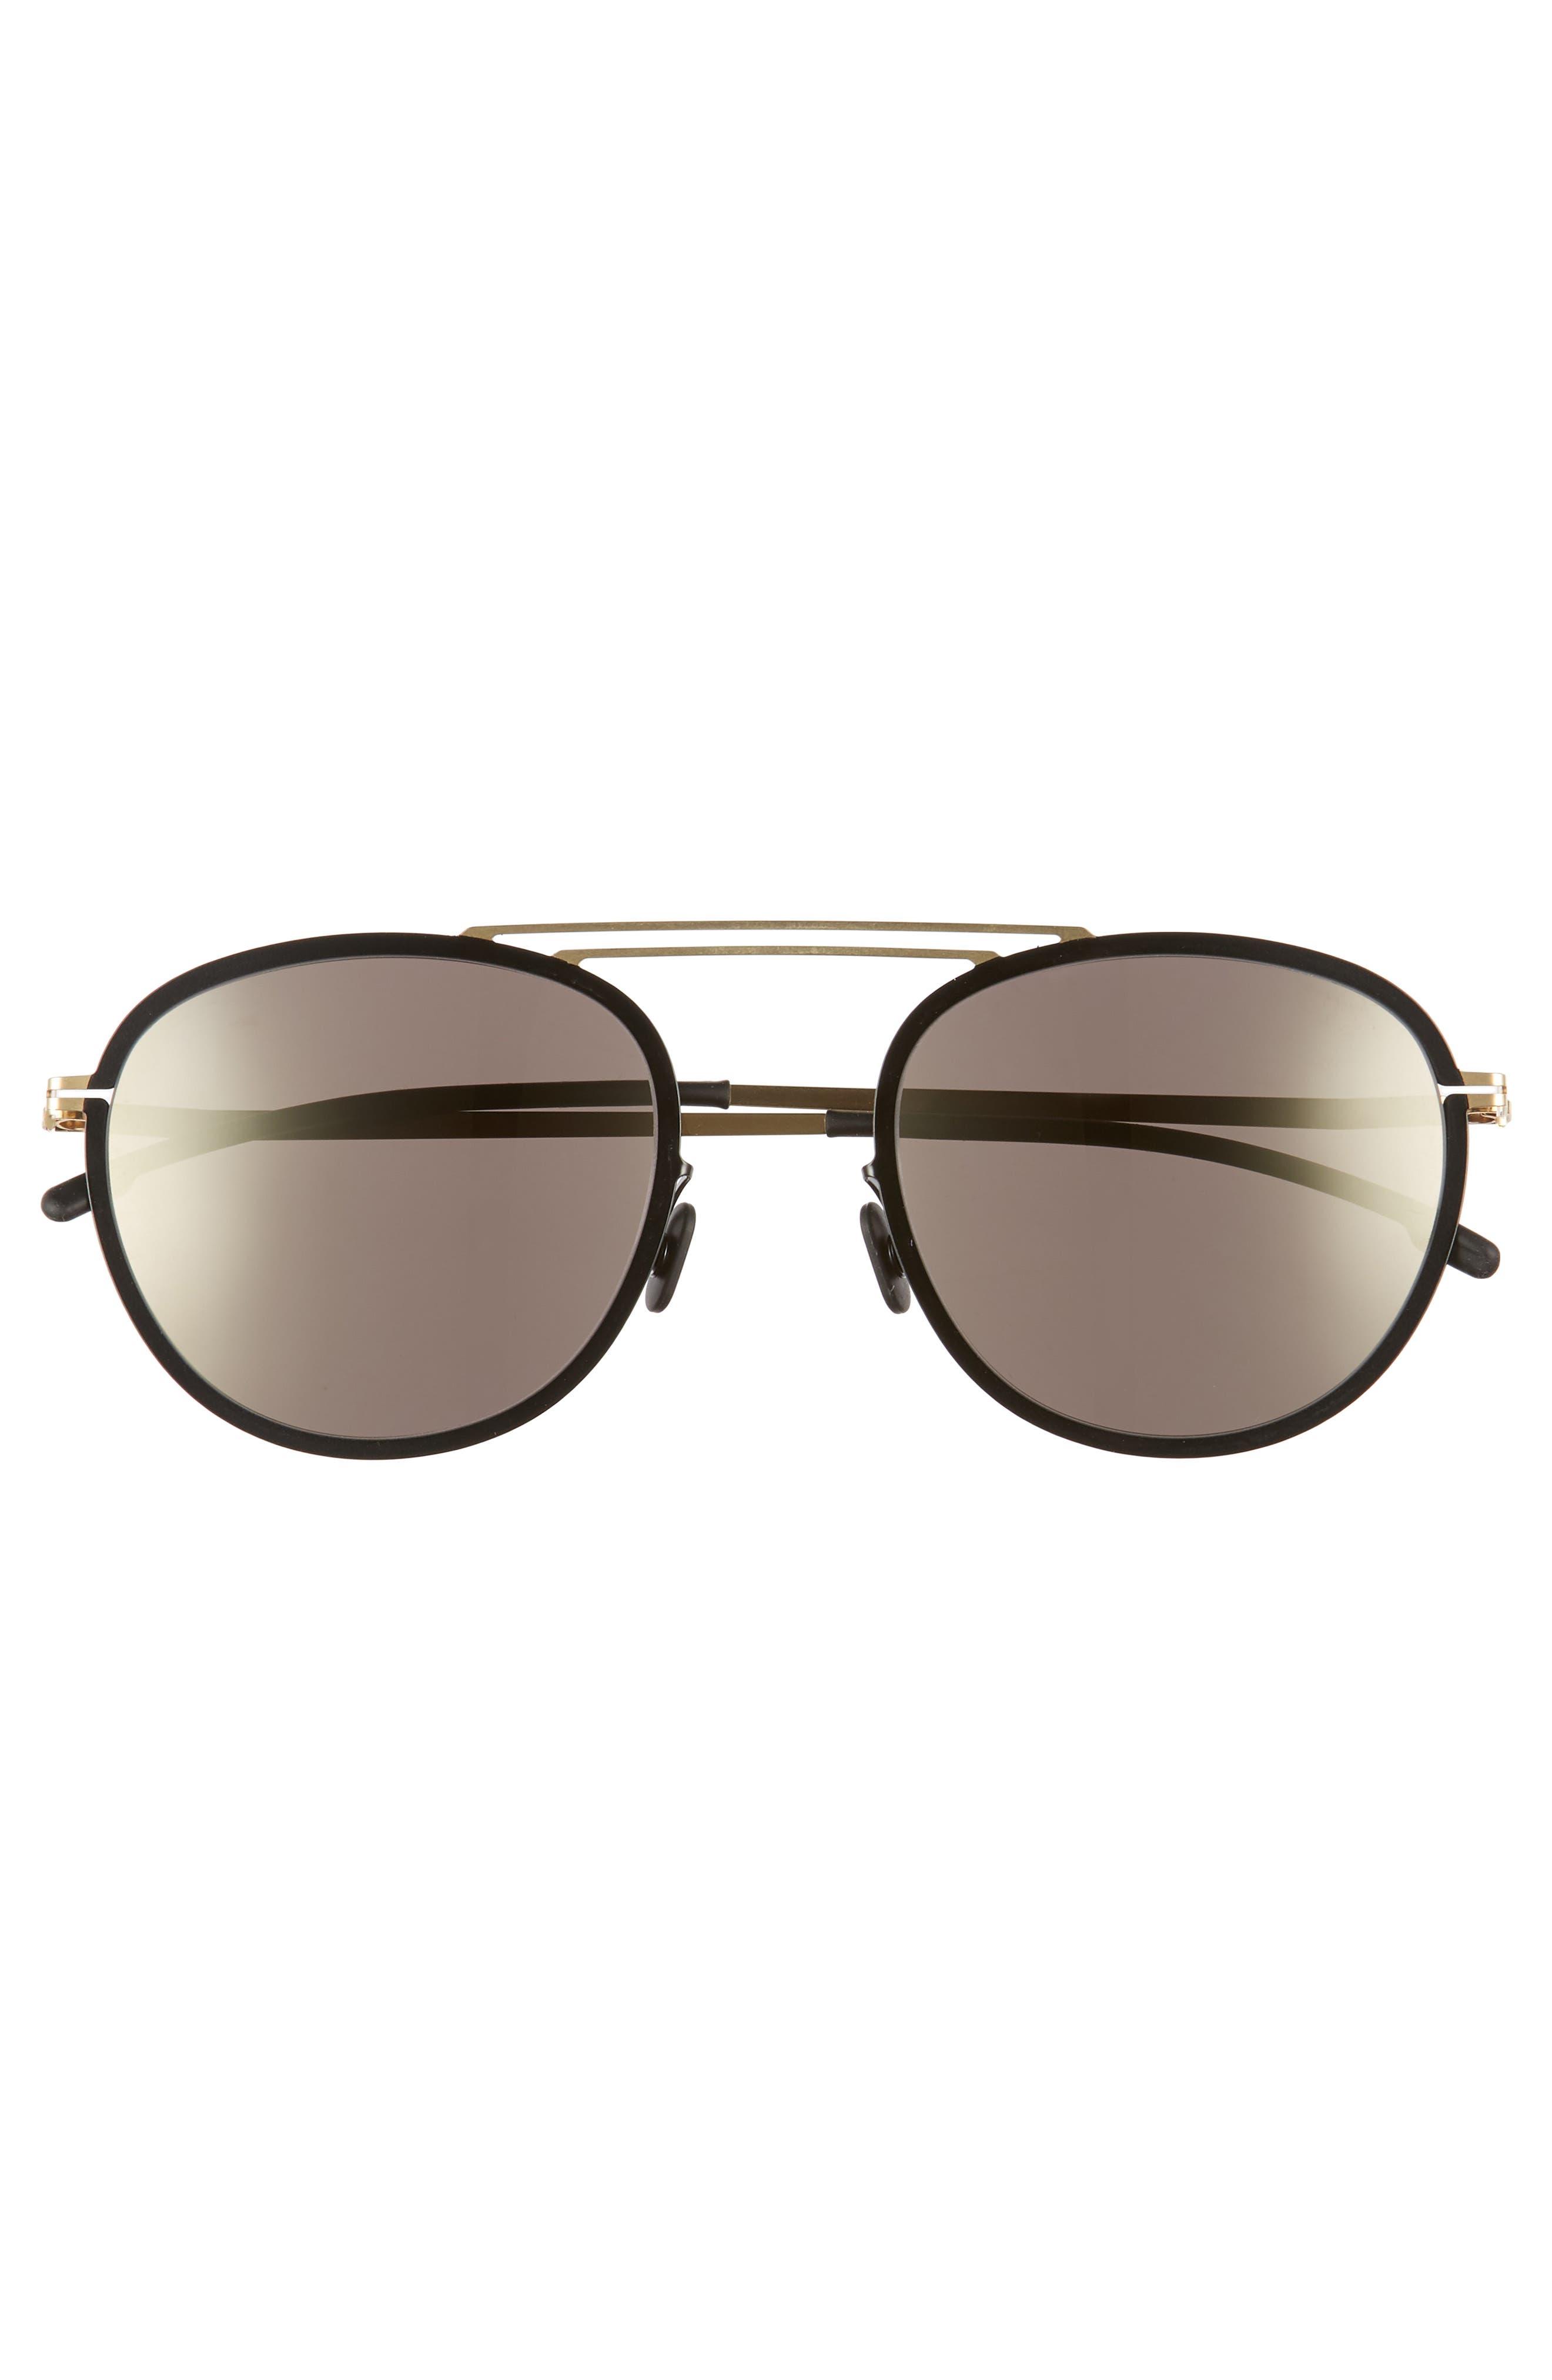 Luigi 52mm Aviator Sunglasses,                             Alternate thumbnail 2, color,                             710